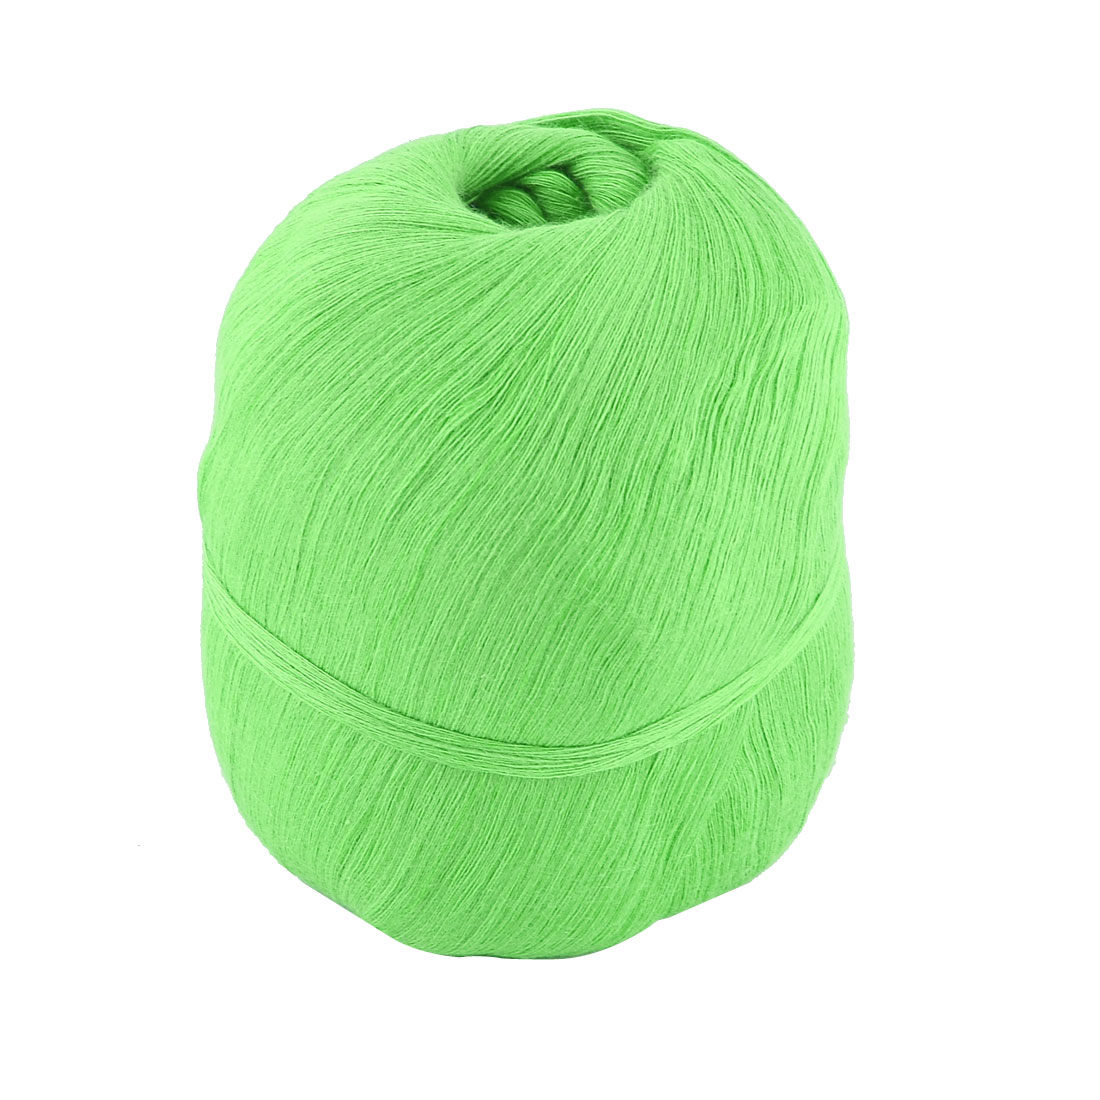 Hand DIY Clothes Tatting Knitting Cotton Thread Embroidery Craft Yarn Light Green